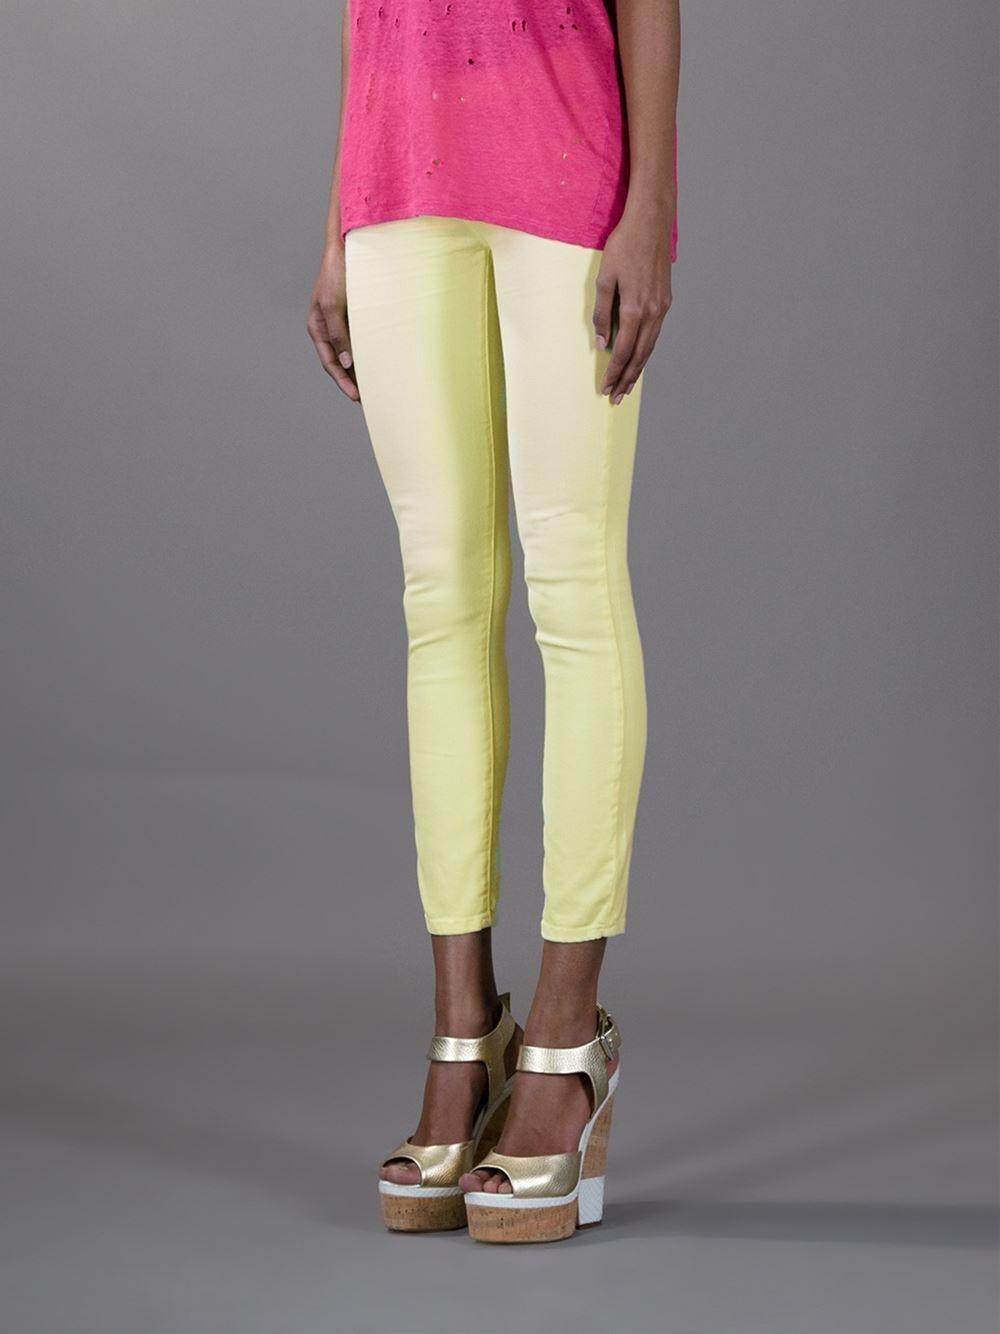 IRO Yellow Cropped Jeans Pants Neon Acid Yellow  198.00  size 26